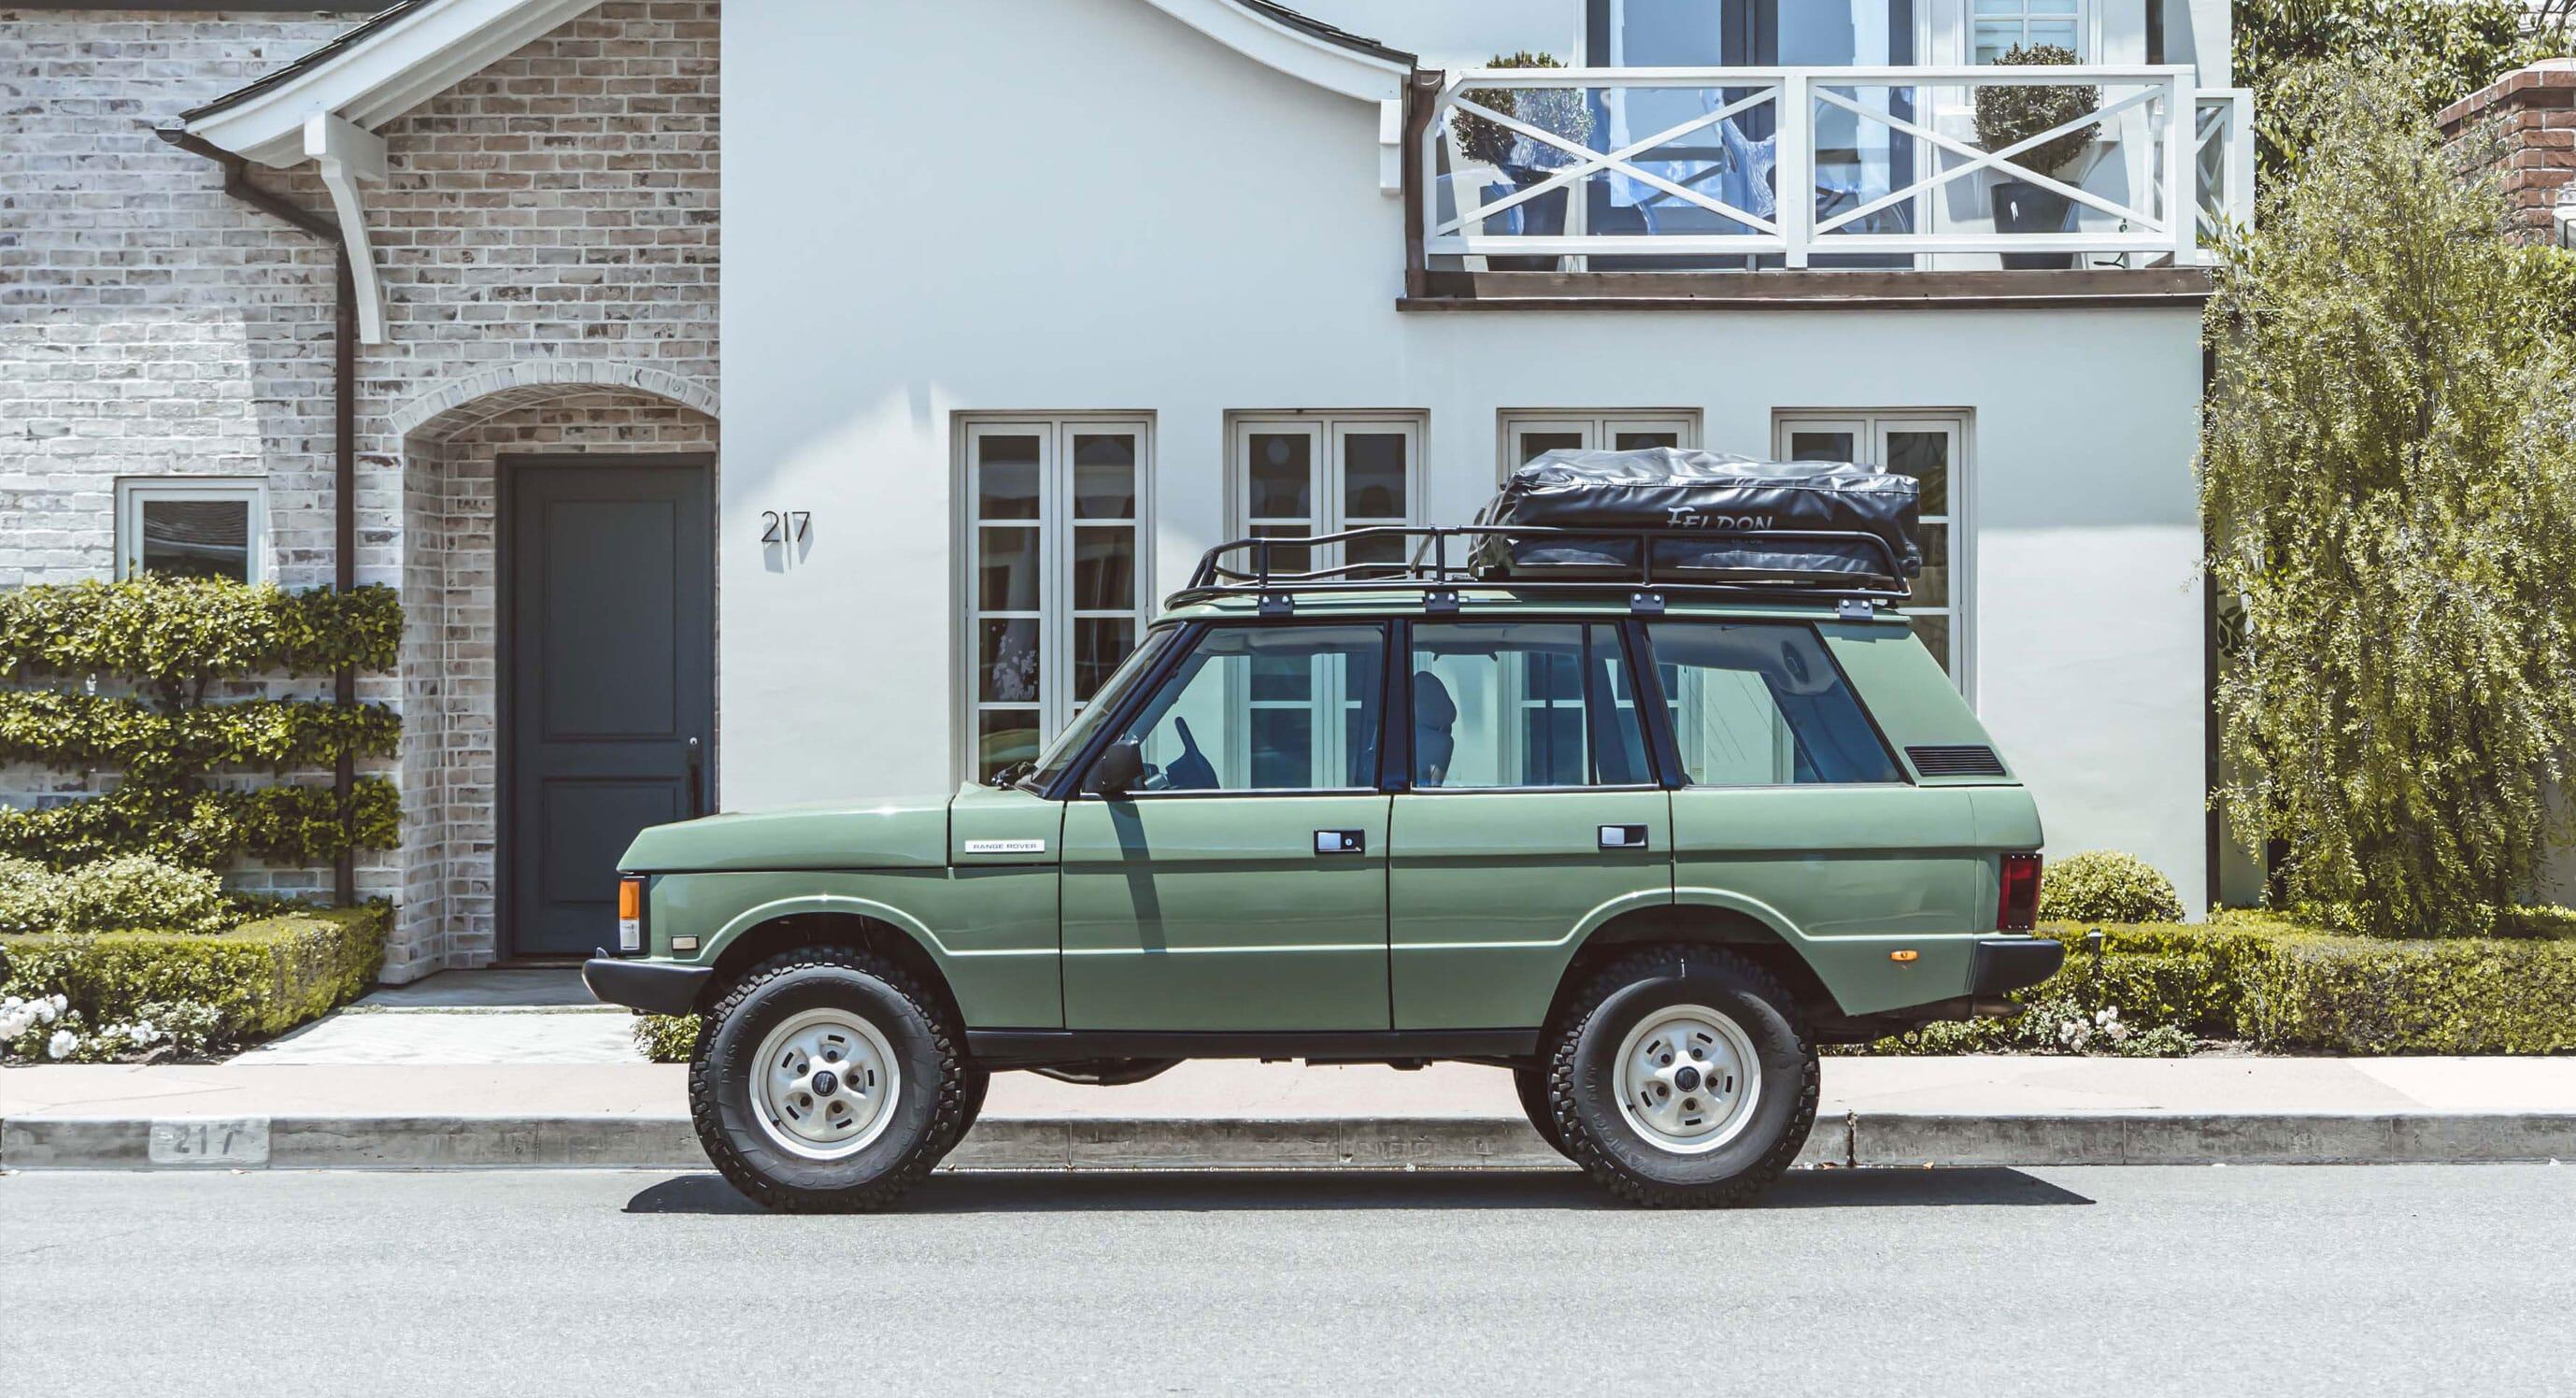 Brooklyn Coachworks Renovate The Heritage Range Rover